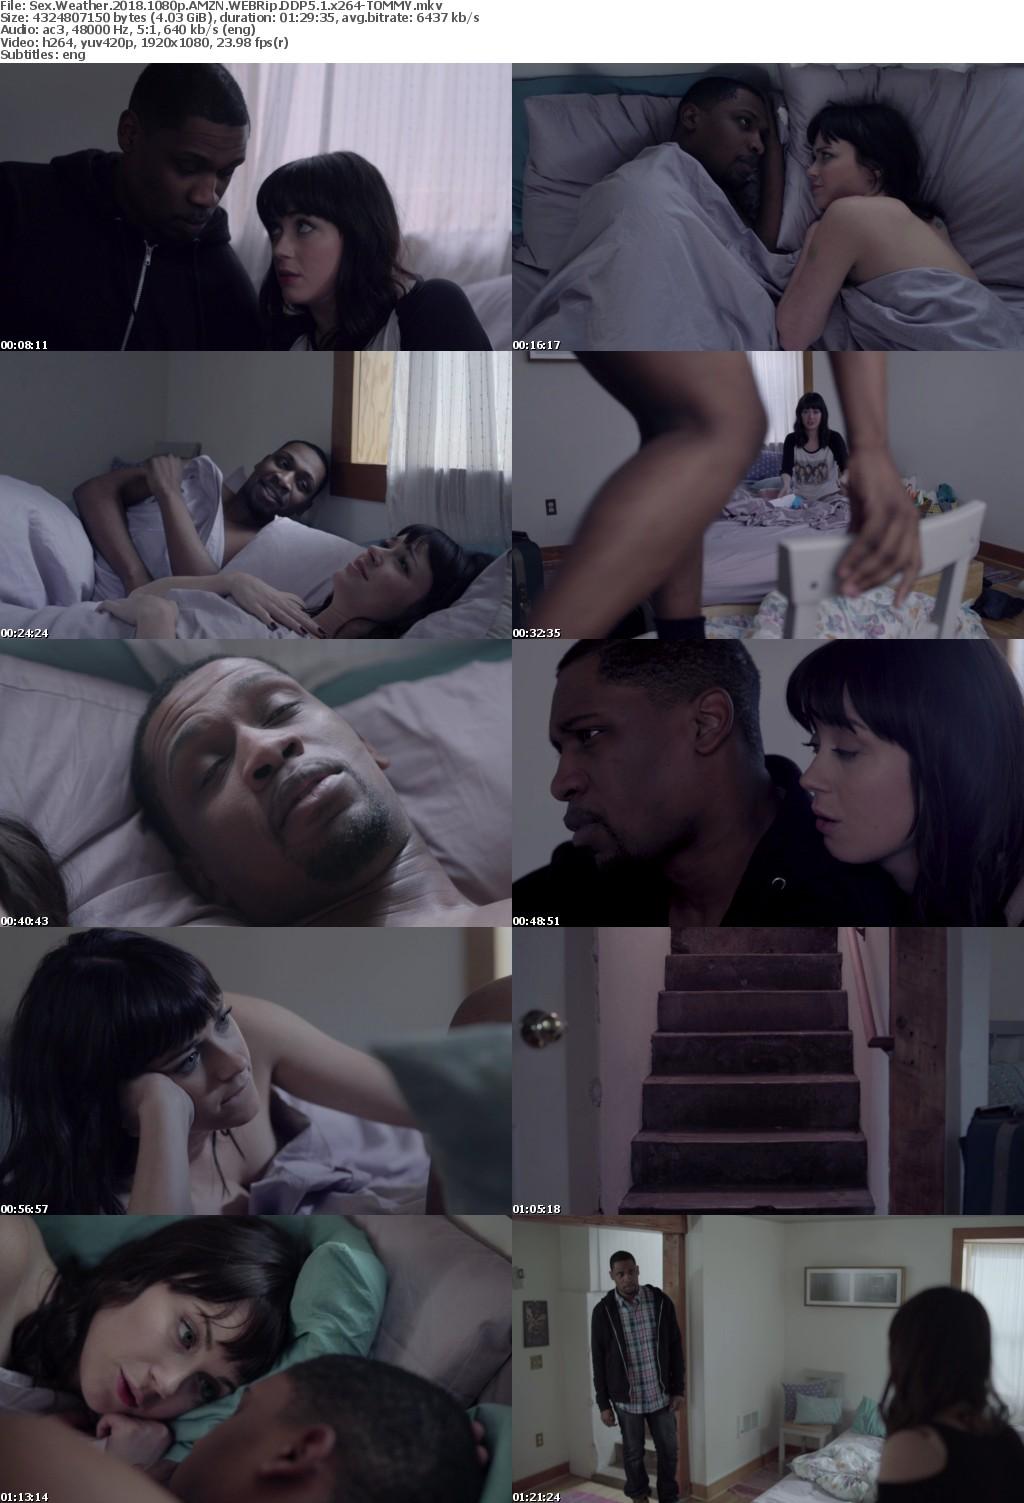 Sex Weather (2018) 1080p AMZN WEBRip DDP5.1 x264-TOMMY